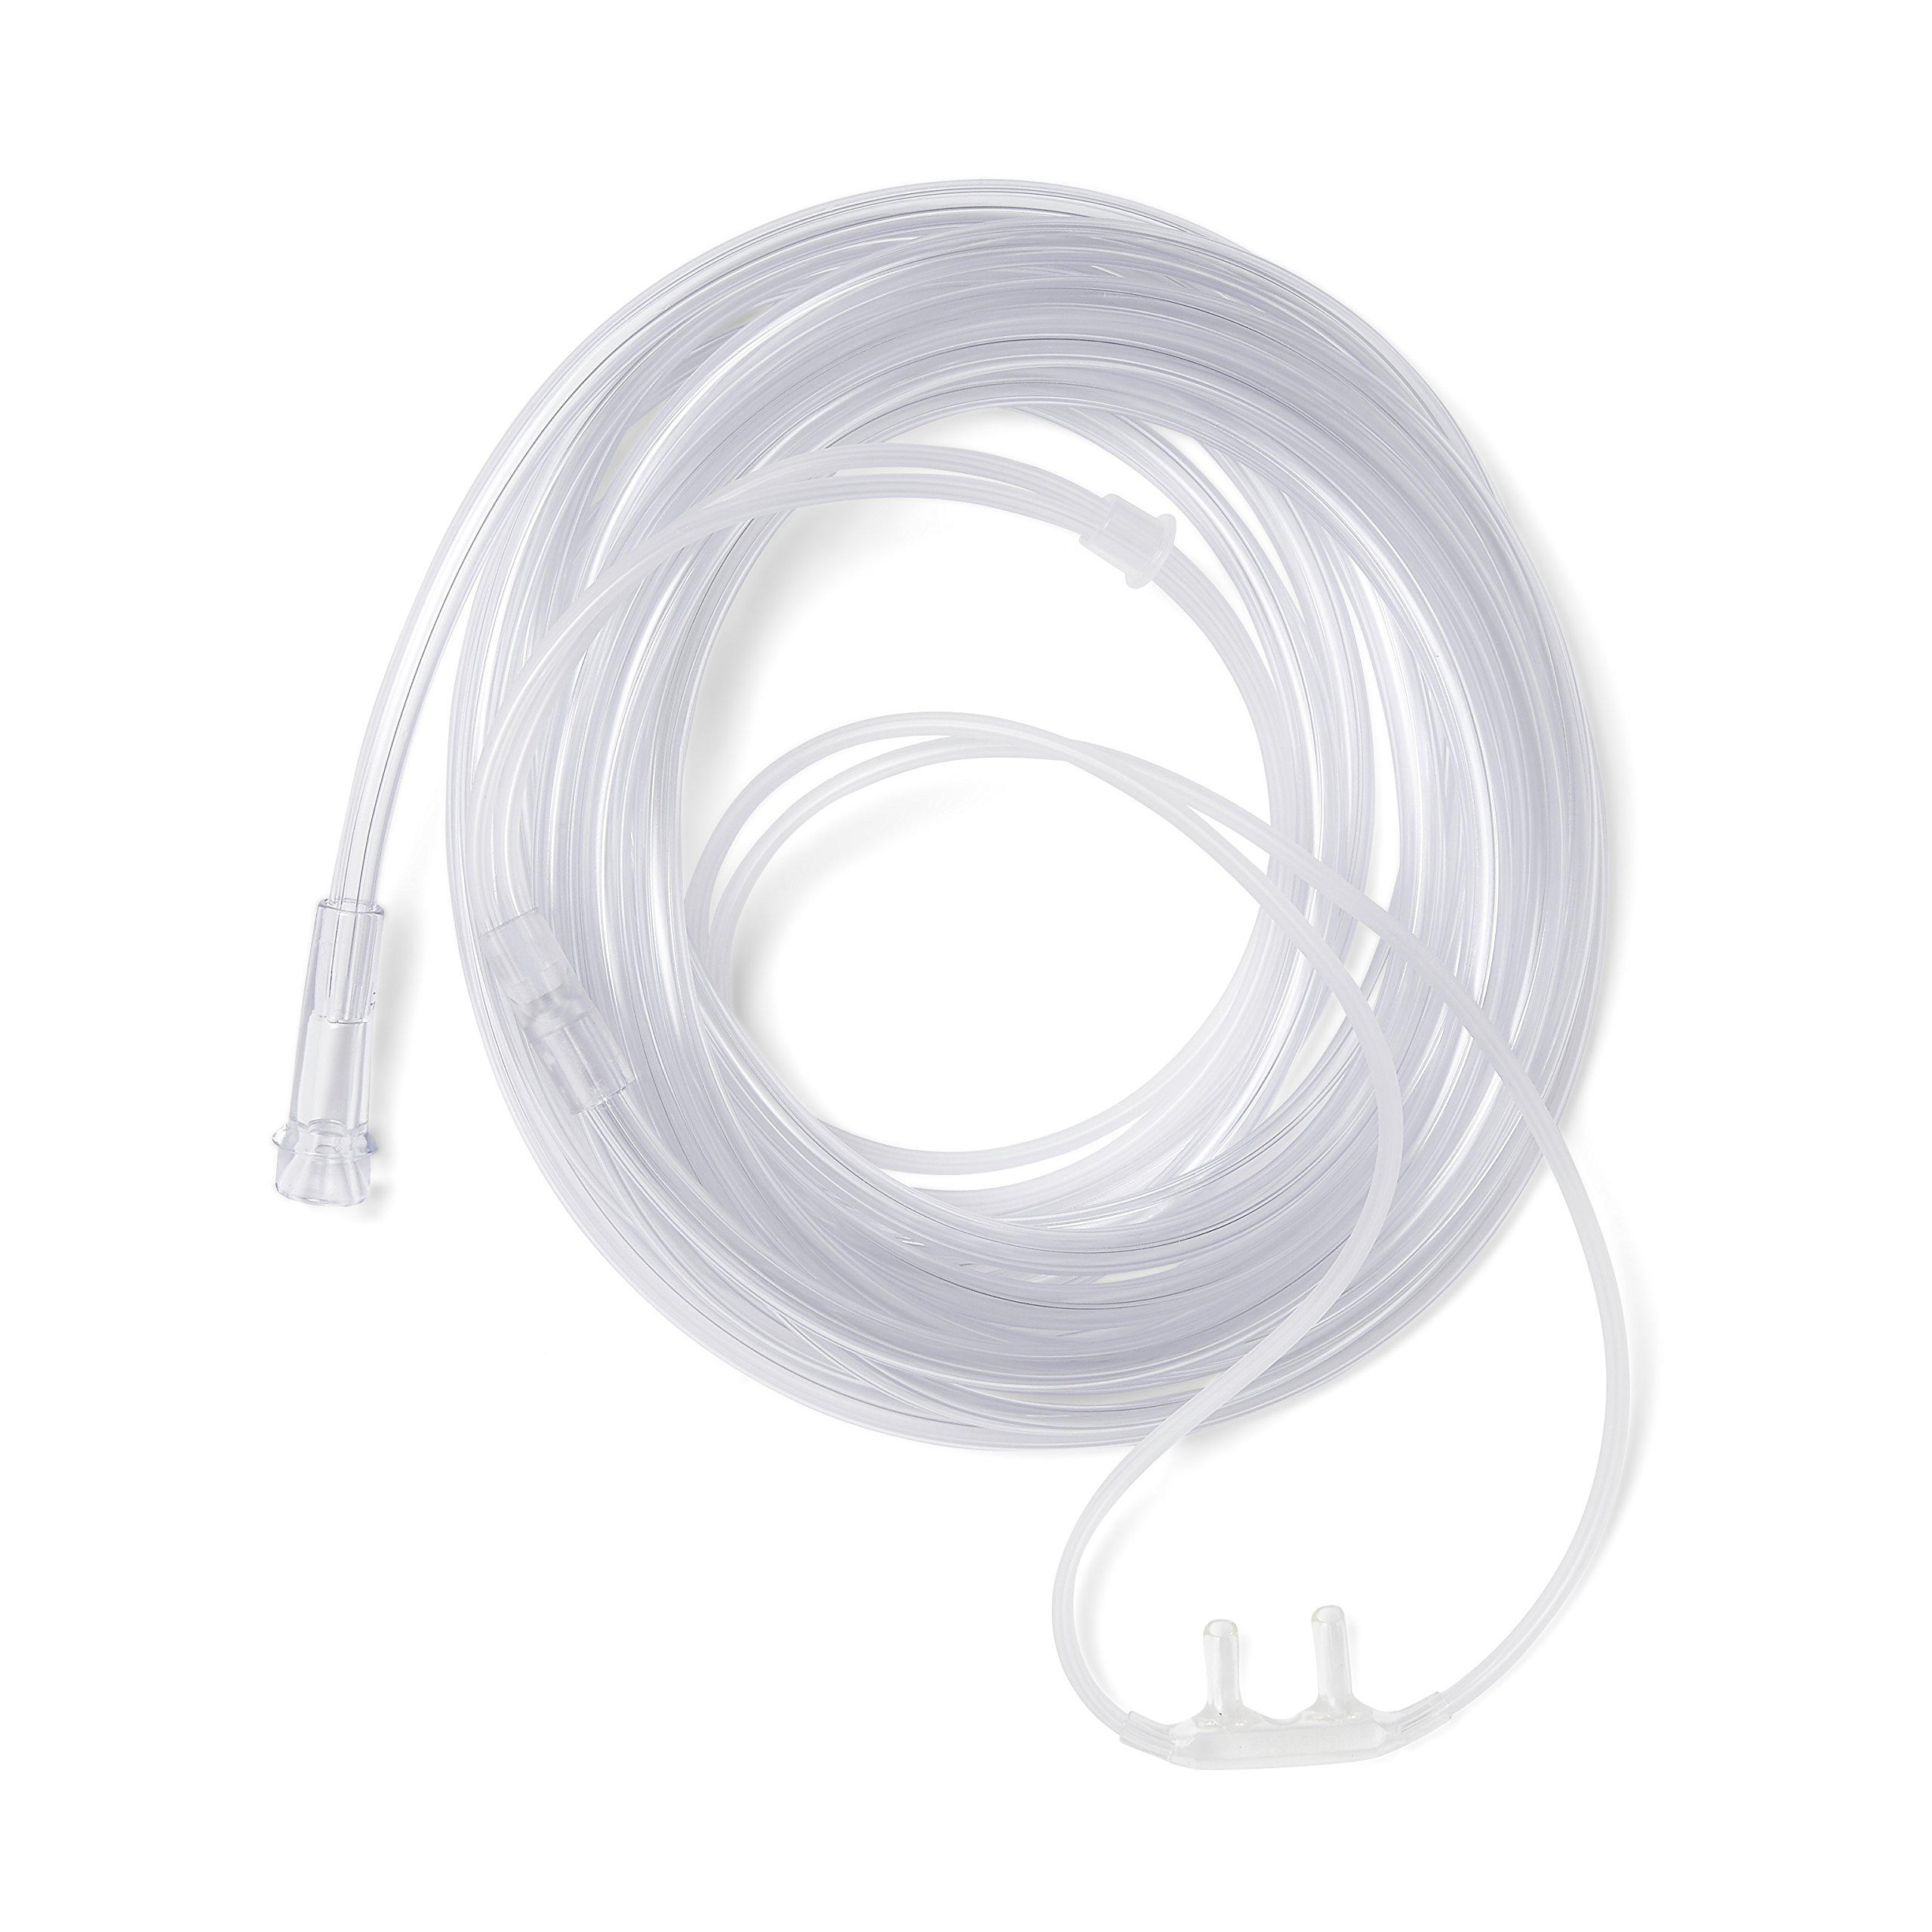 amazon com love2breathe clamp for 1 8 oxygen cannula breathing